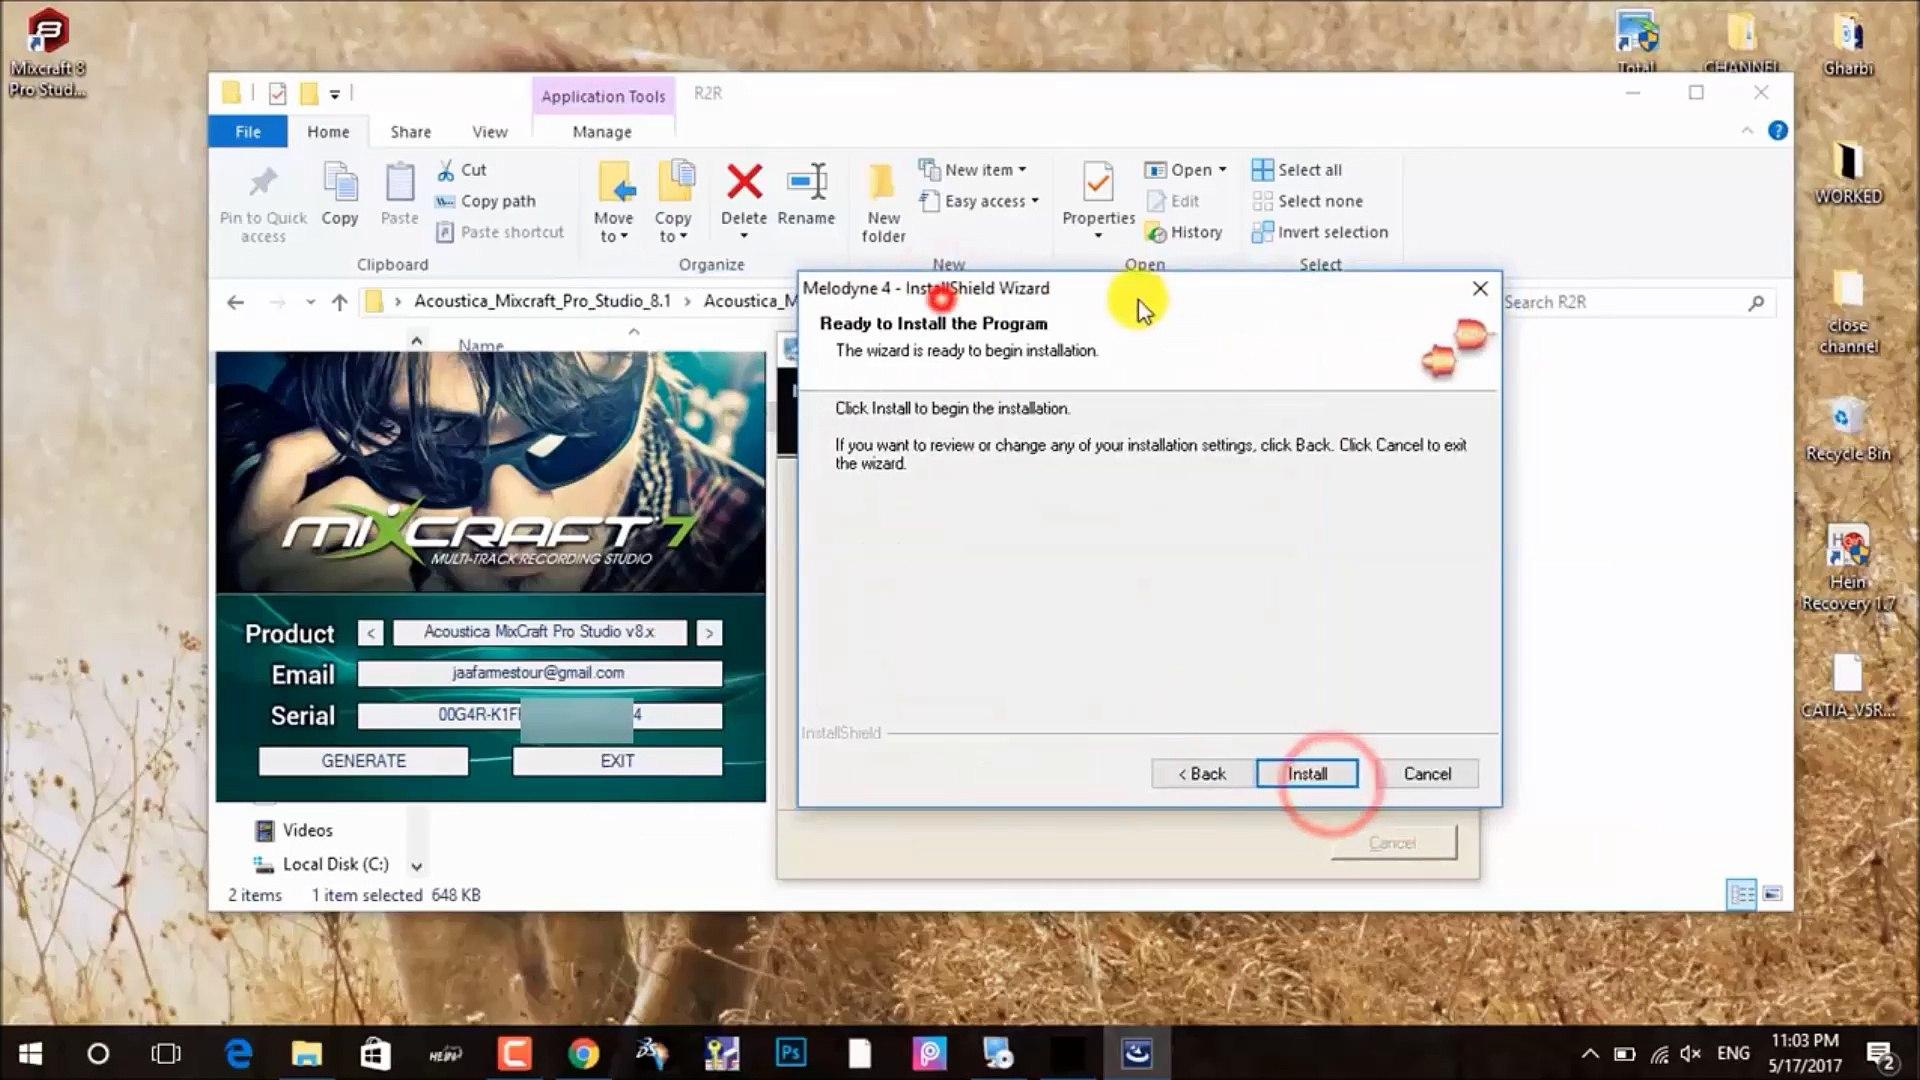 Acoustica Mixcraft Pro Studio 8 1 - Easy Registration